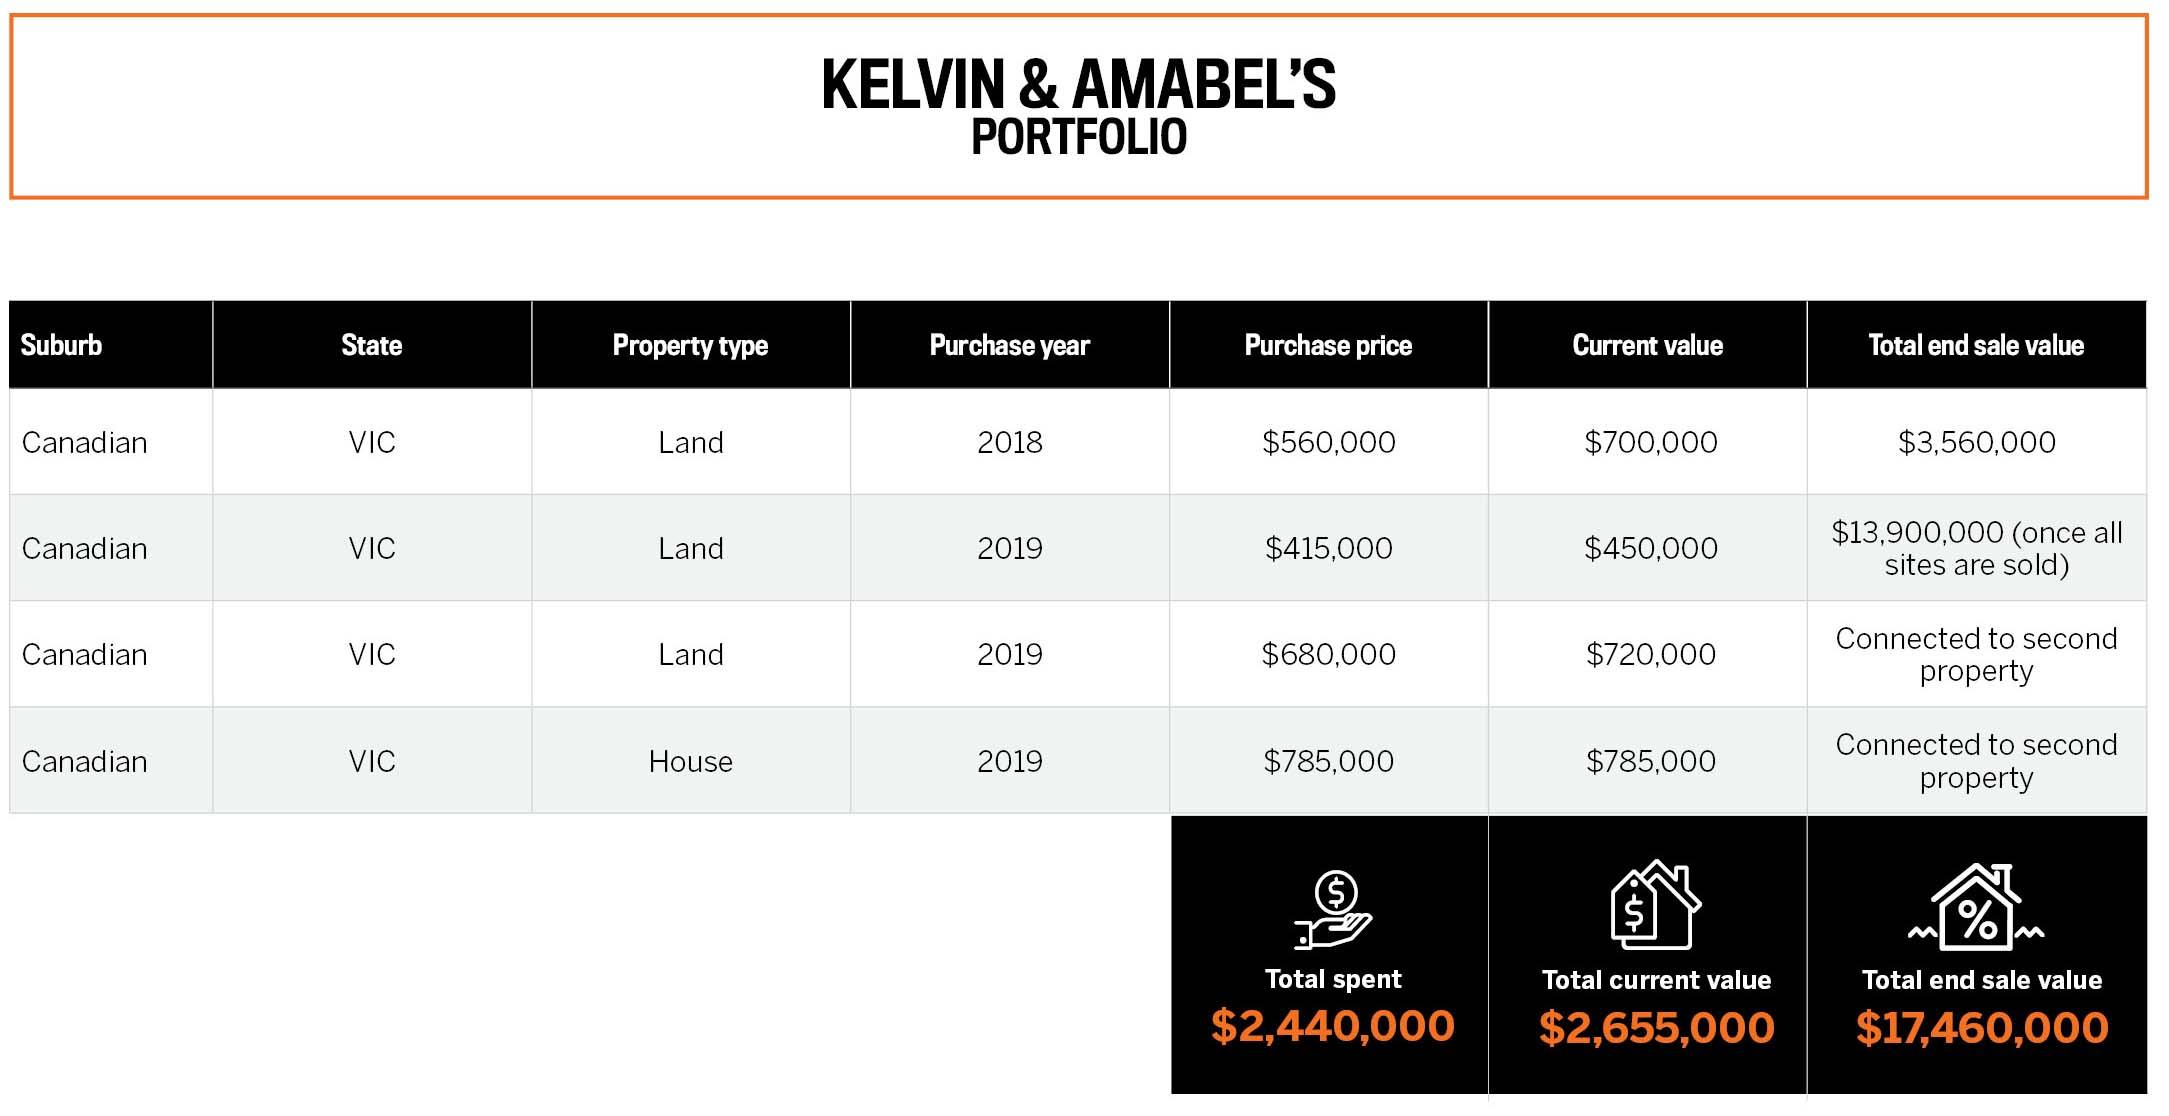 Kelvin & Amabel's Portfolio